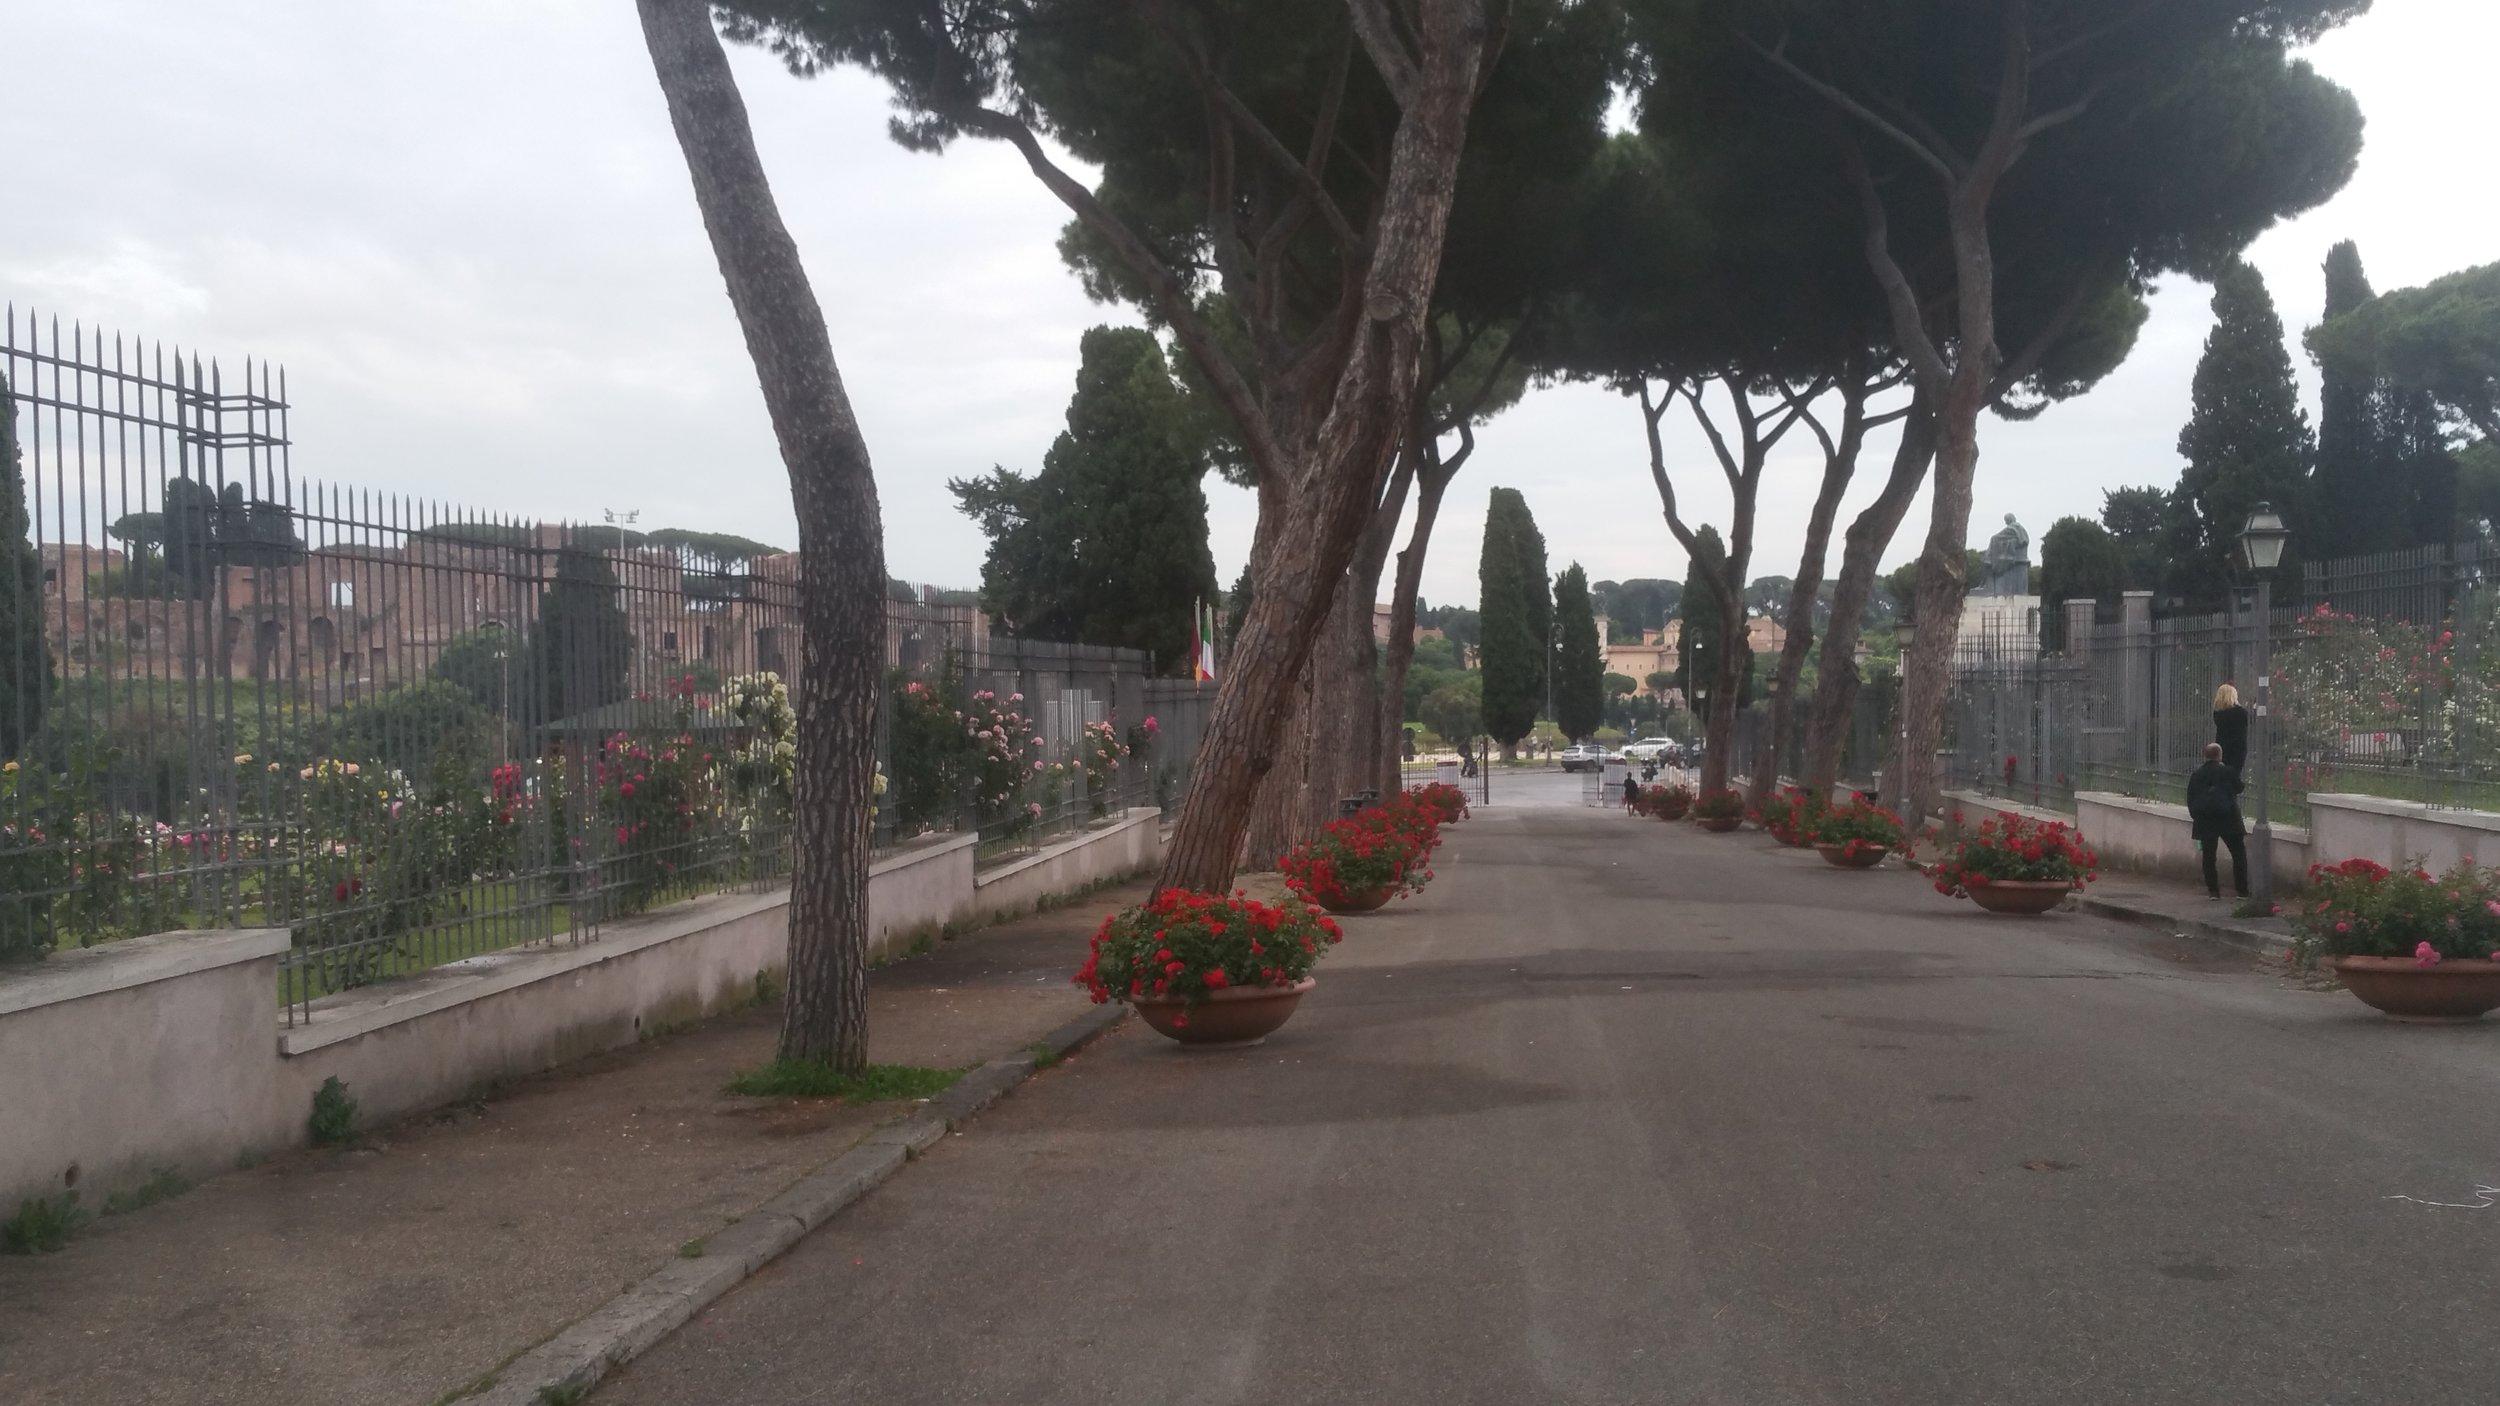 Garden in Rome, Italy